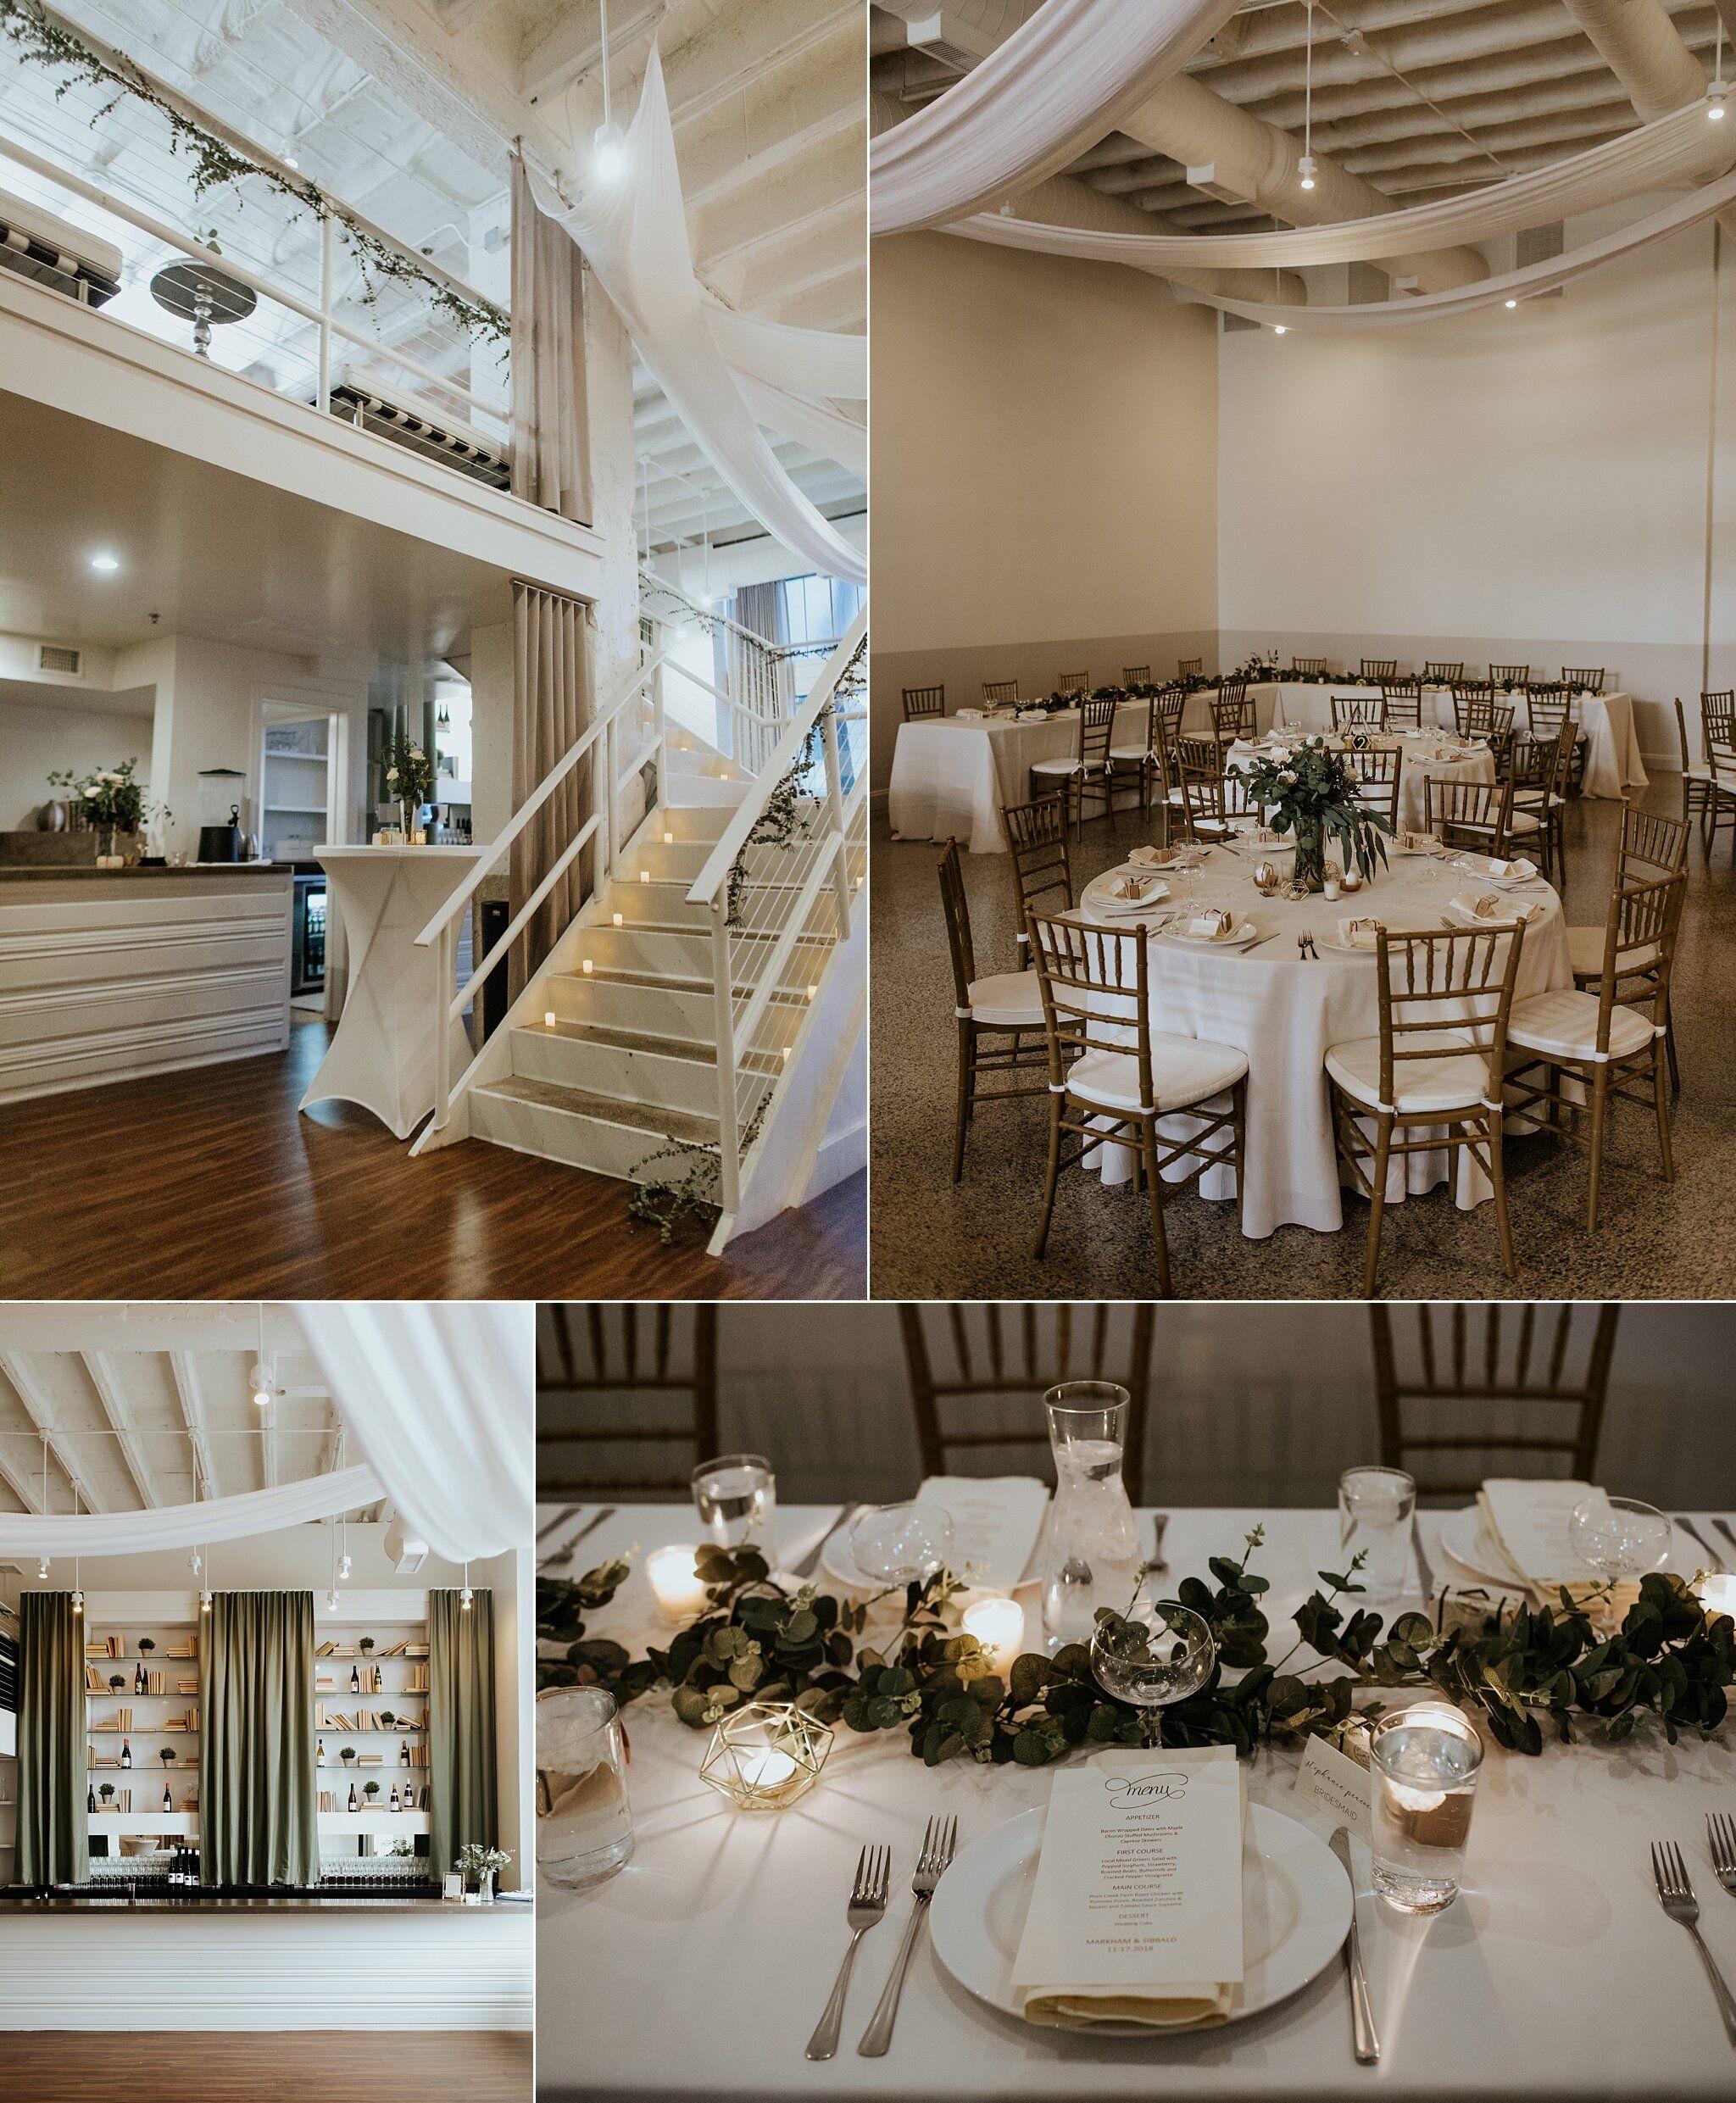 Pin By Abi Knapton On Wedding In 2020 Nebraska Wedding Best Wedding Venues Nebraska